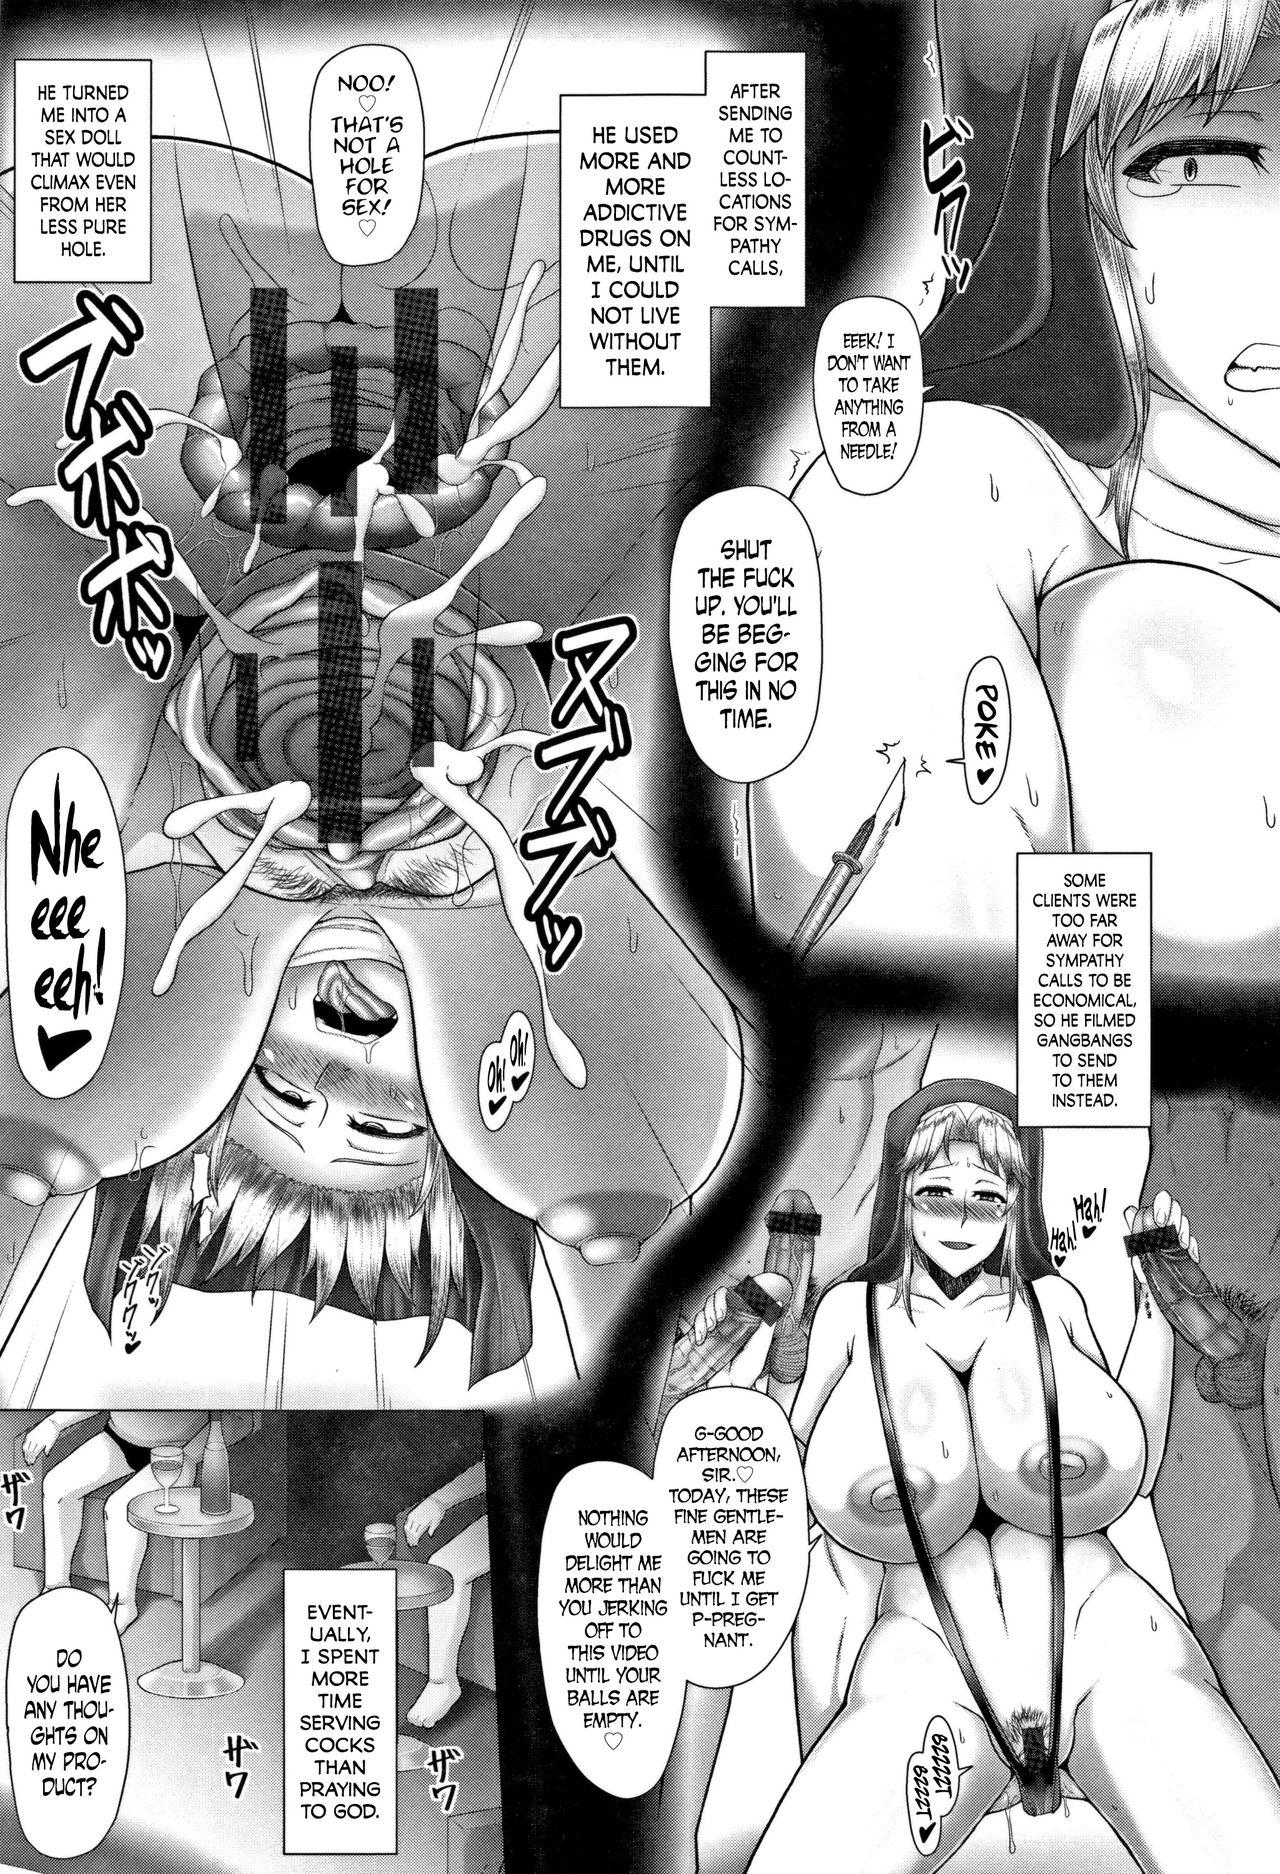 [Inoue Nanaki] Joushiki Daha! Kuro Gal Bitch-ka Seikatsu Ch. 1-3, 5-8 [English] [Dark Mac + N04h] 50